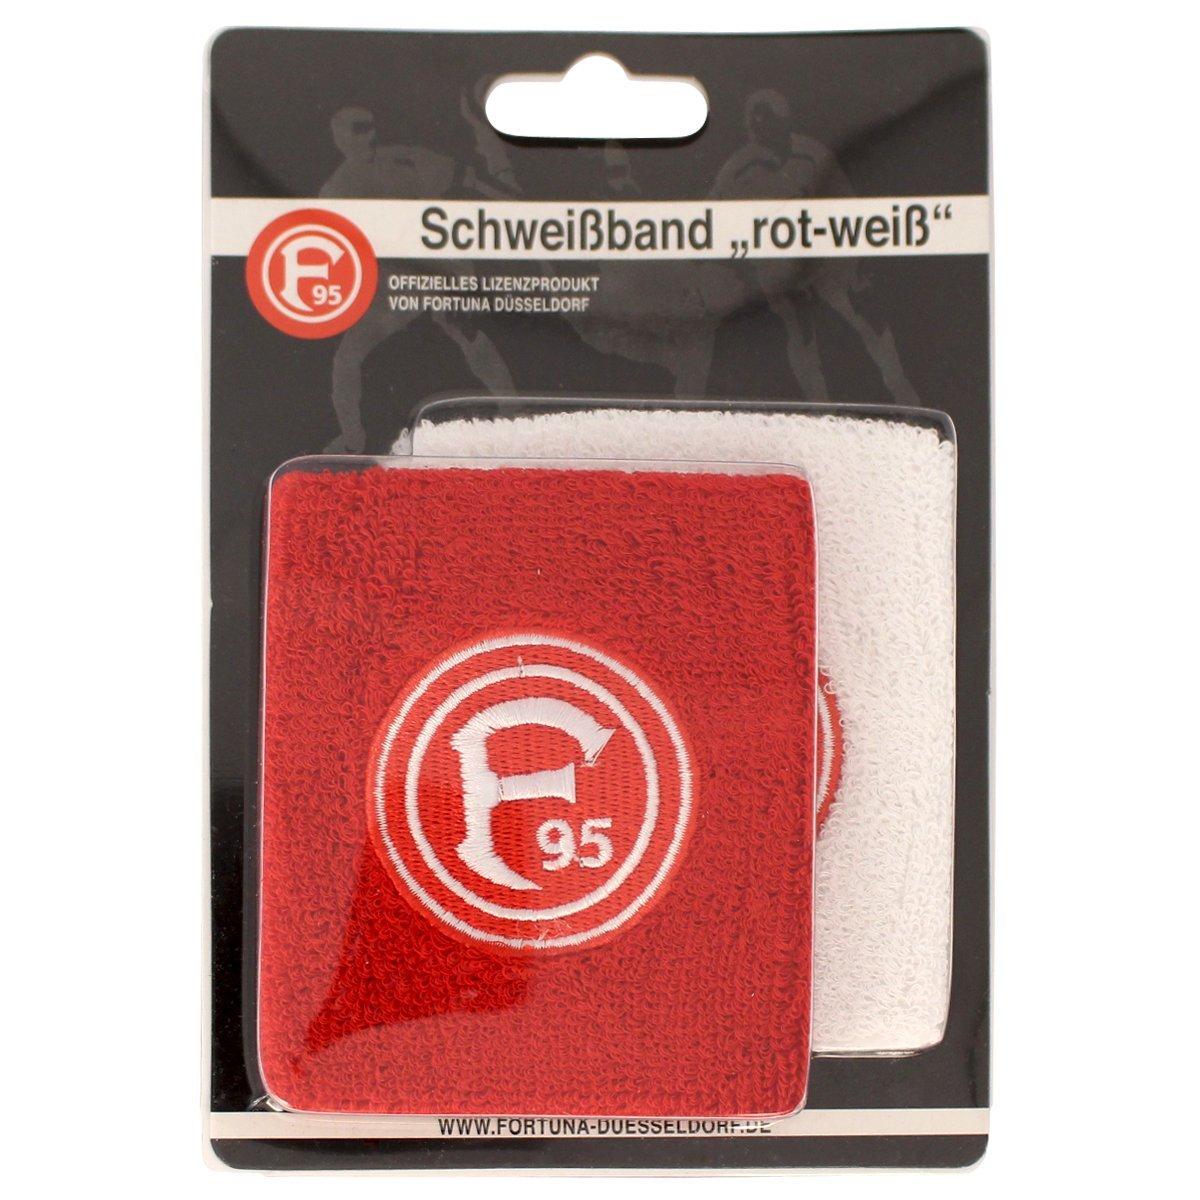 Fortuna D/üsseldorf Schwei/ßband rot-wei/ß